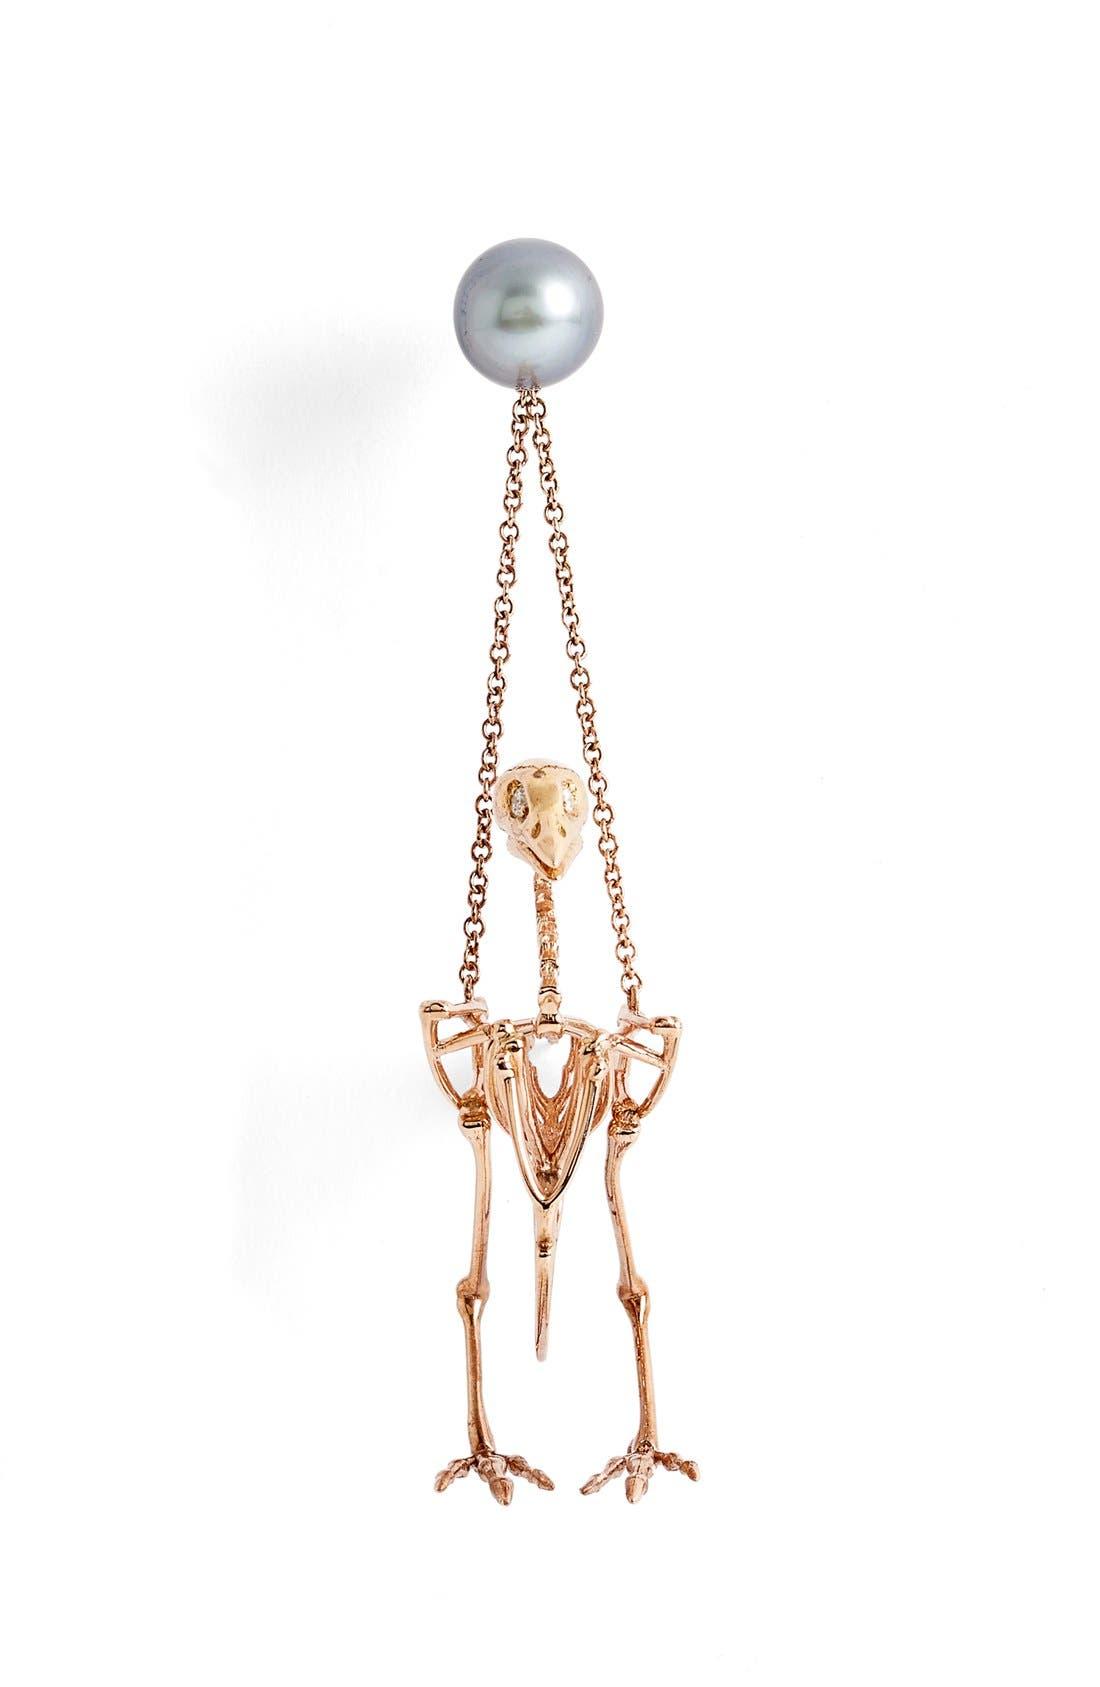 South Sea Pearl & Diamond Small Quail Earring,                             Alternate thumbnail 2, color,                             950